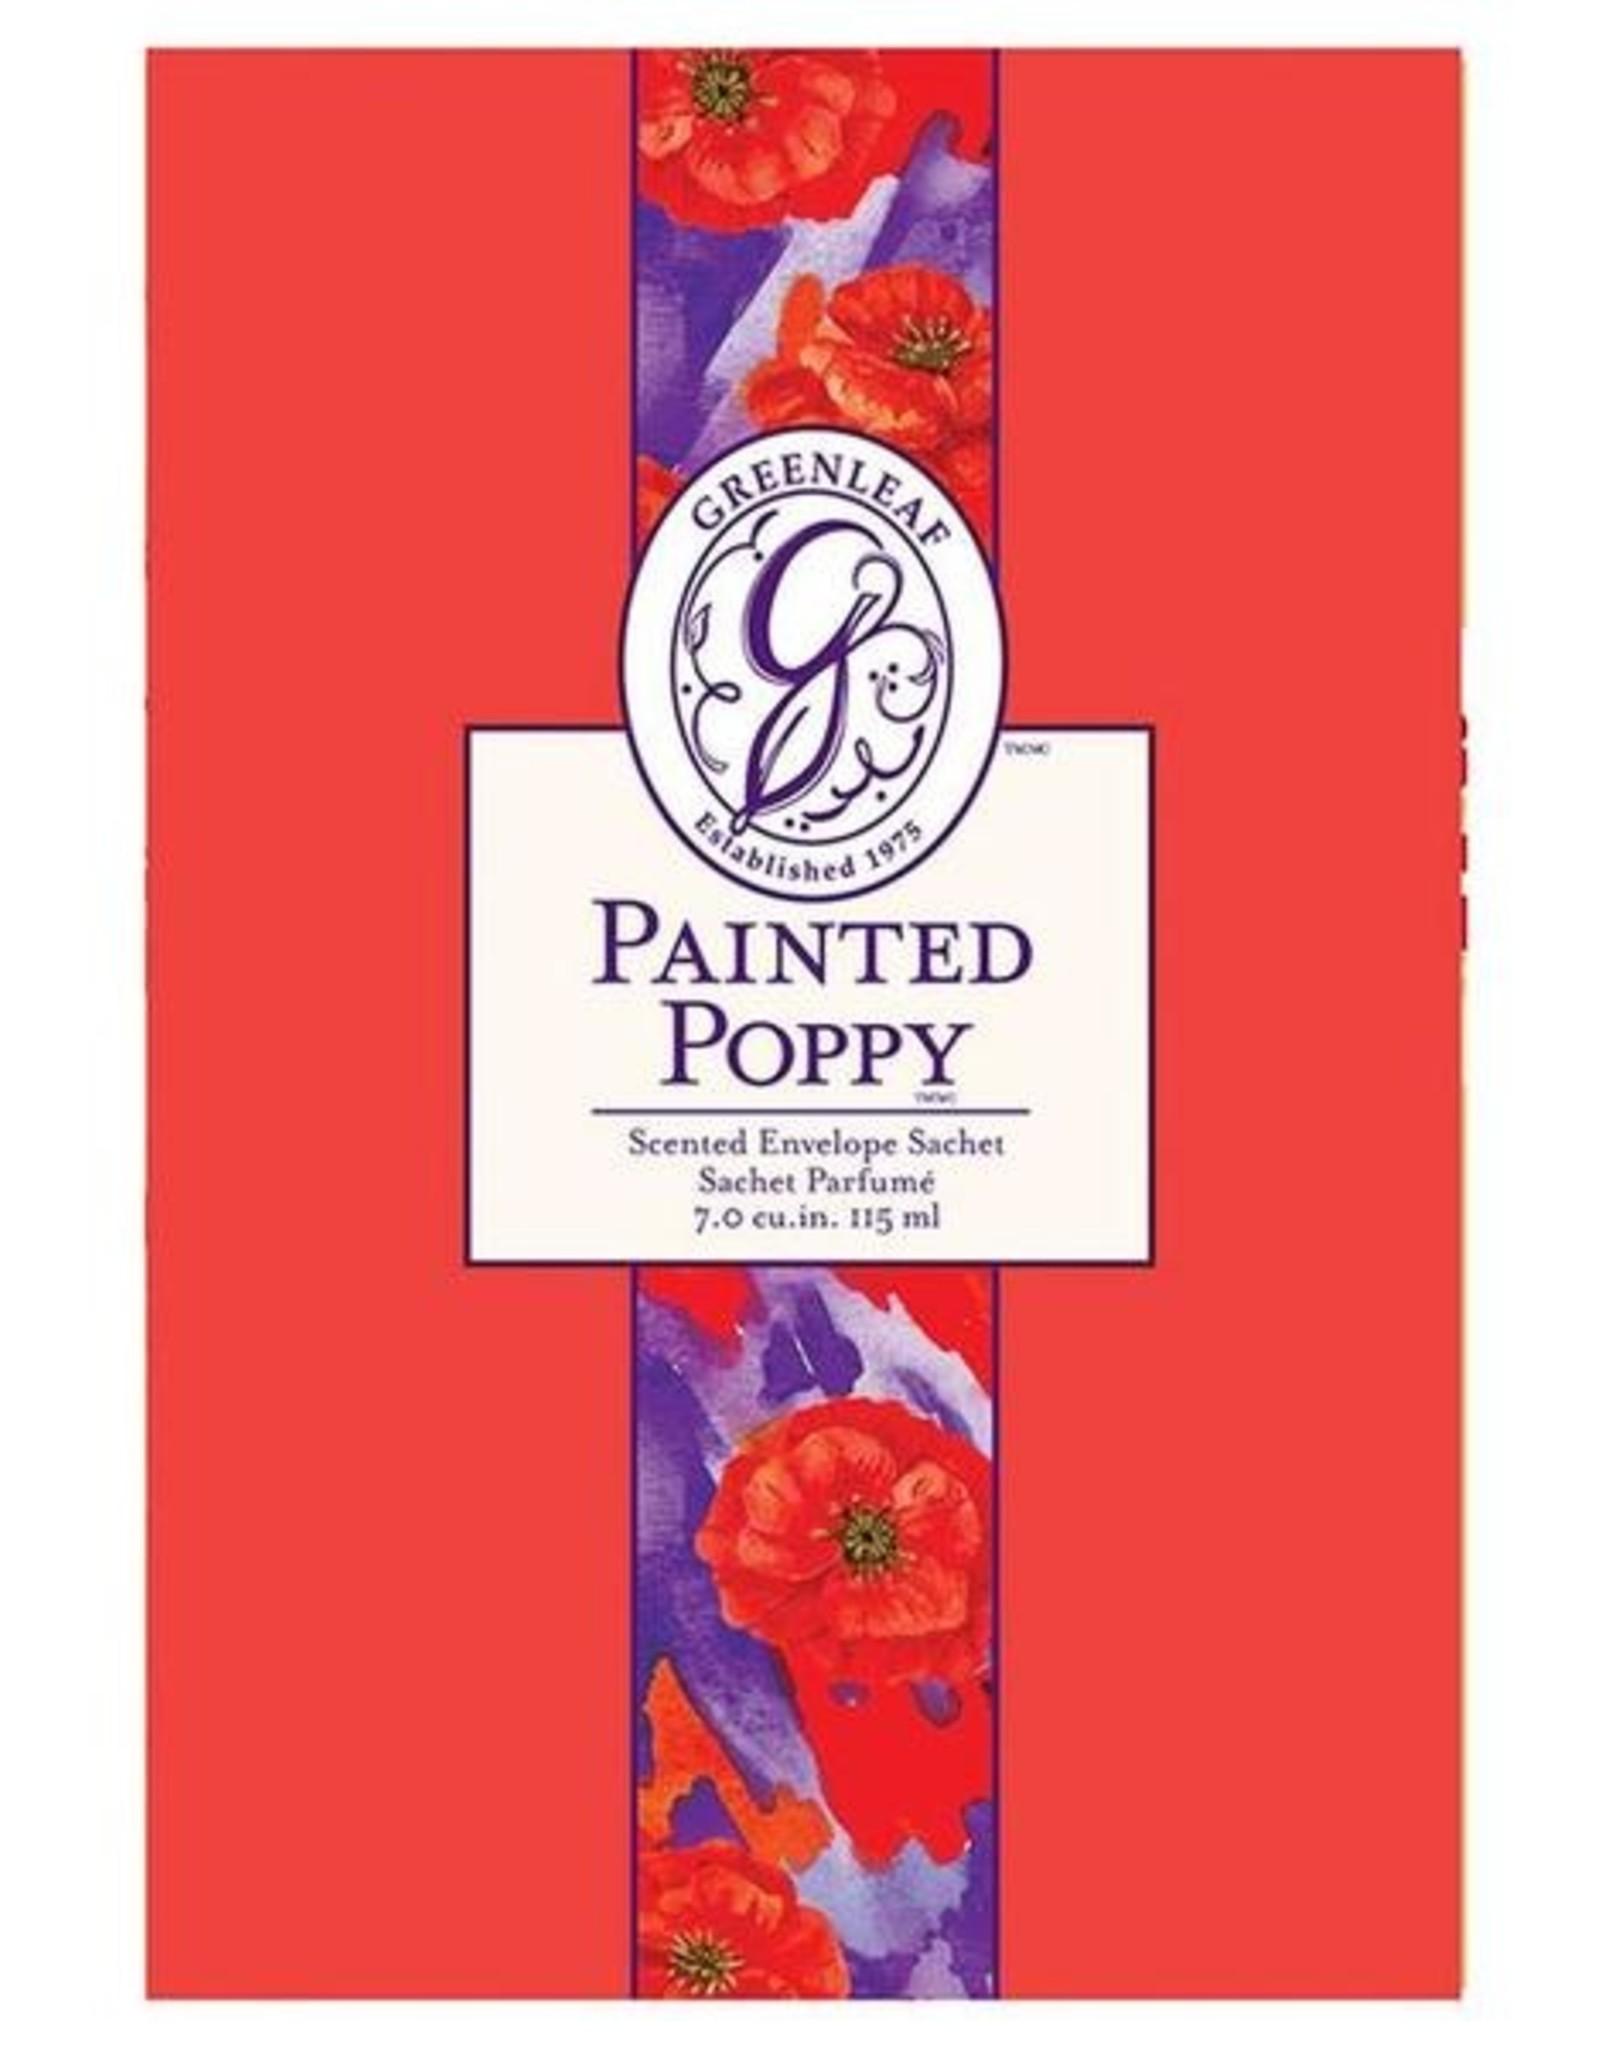 Greenleaf Greenleaf LG Sachet Painted Poppy